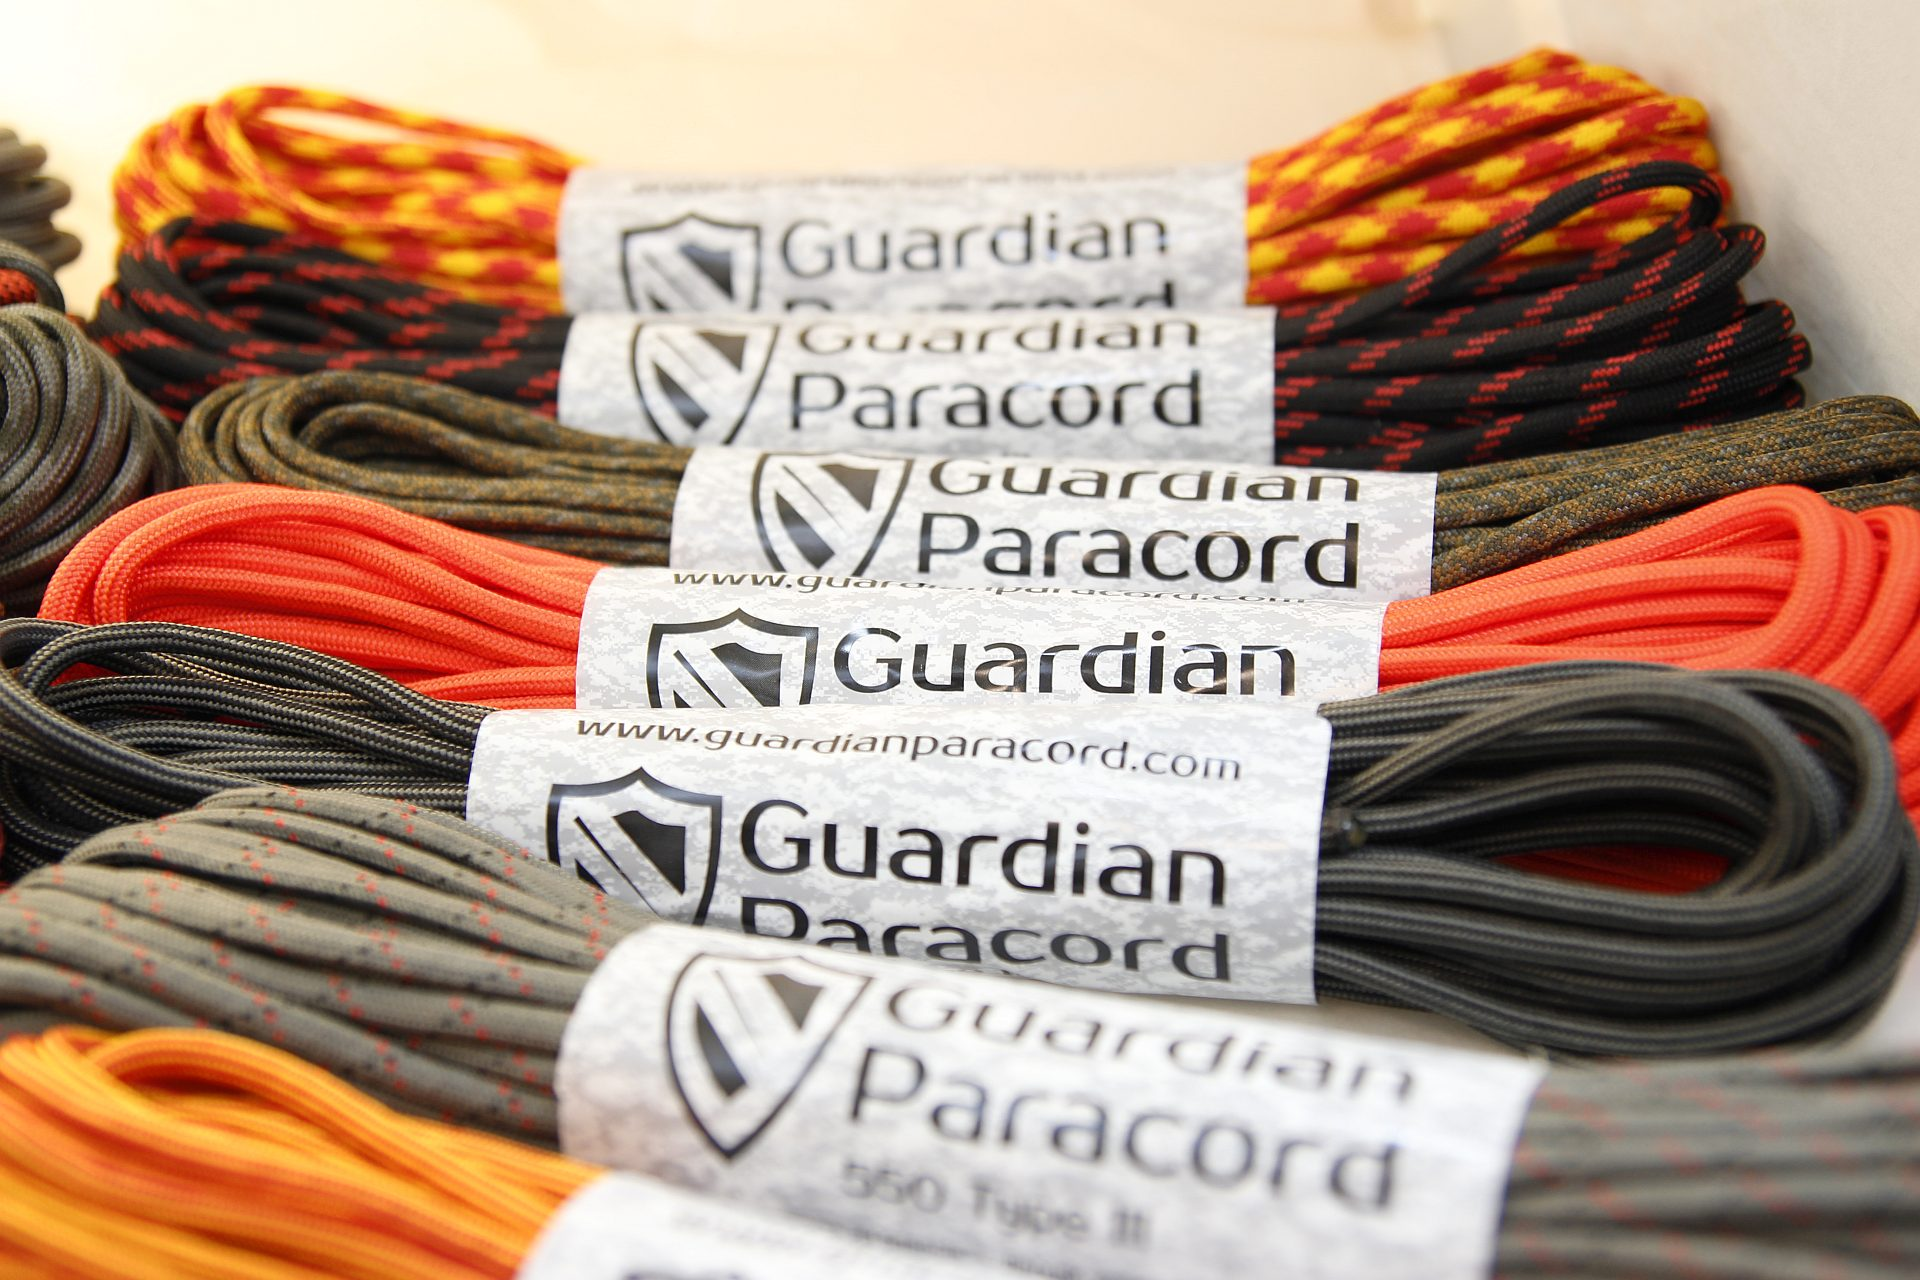 Guardian paracord